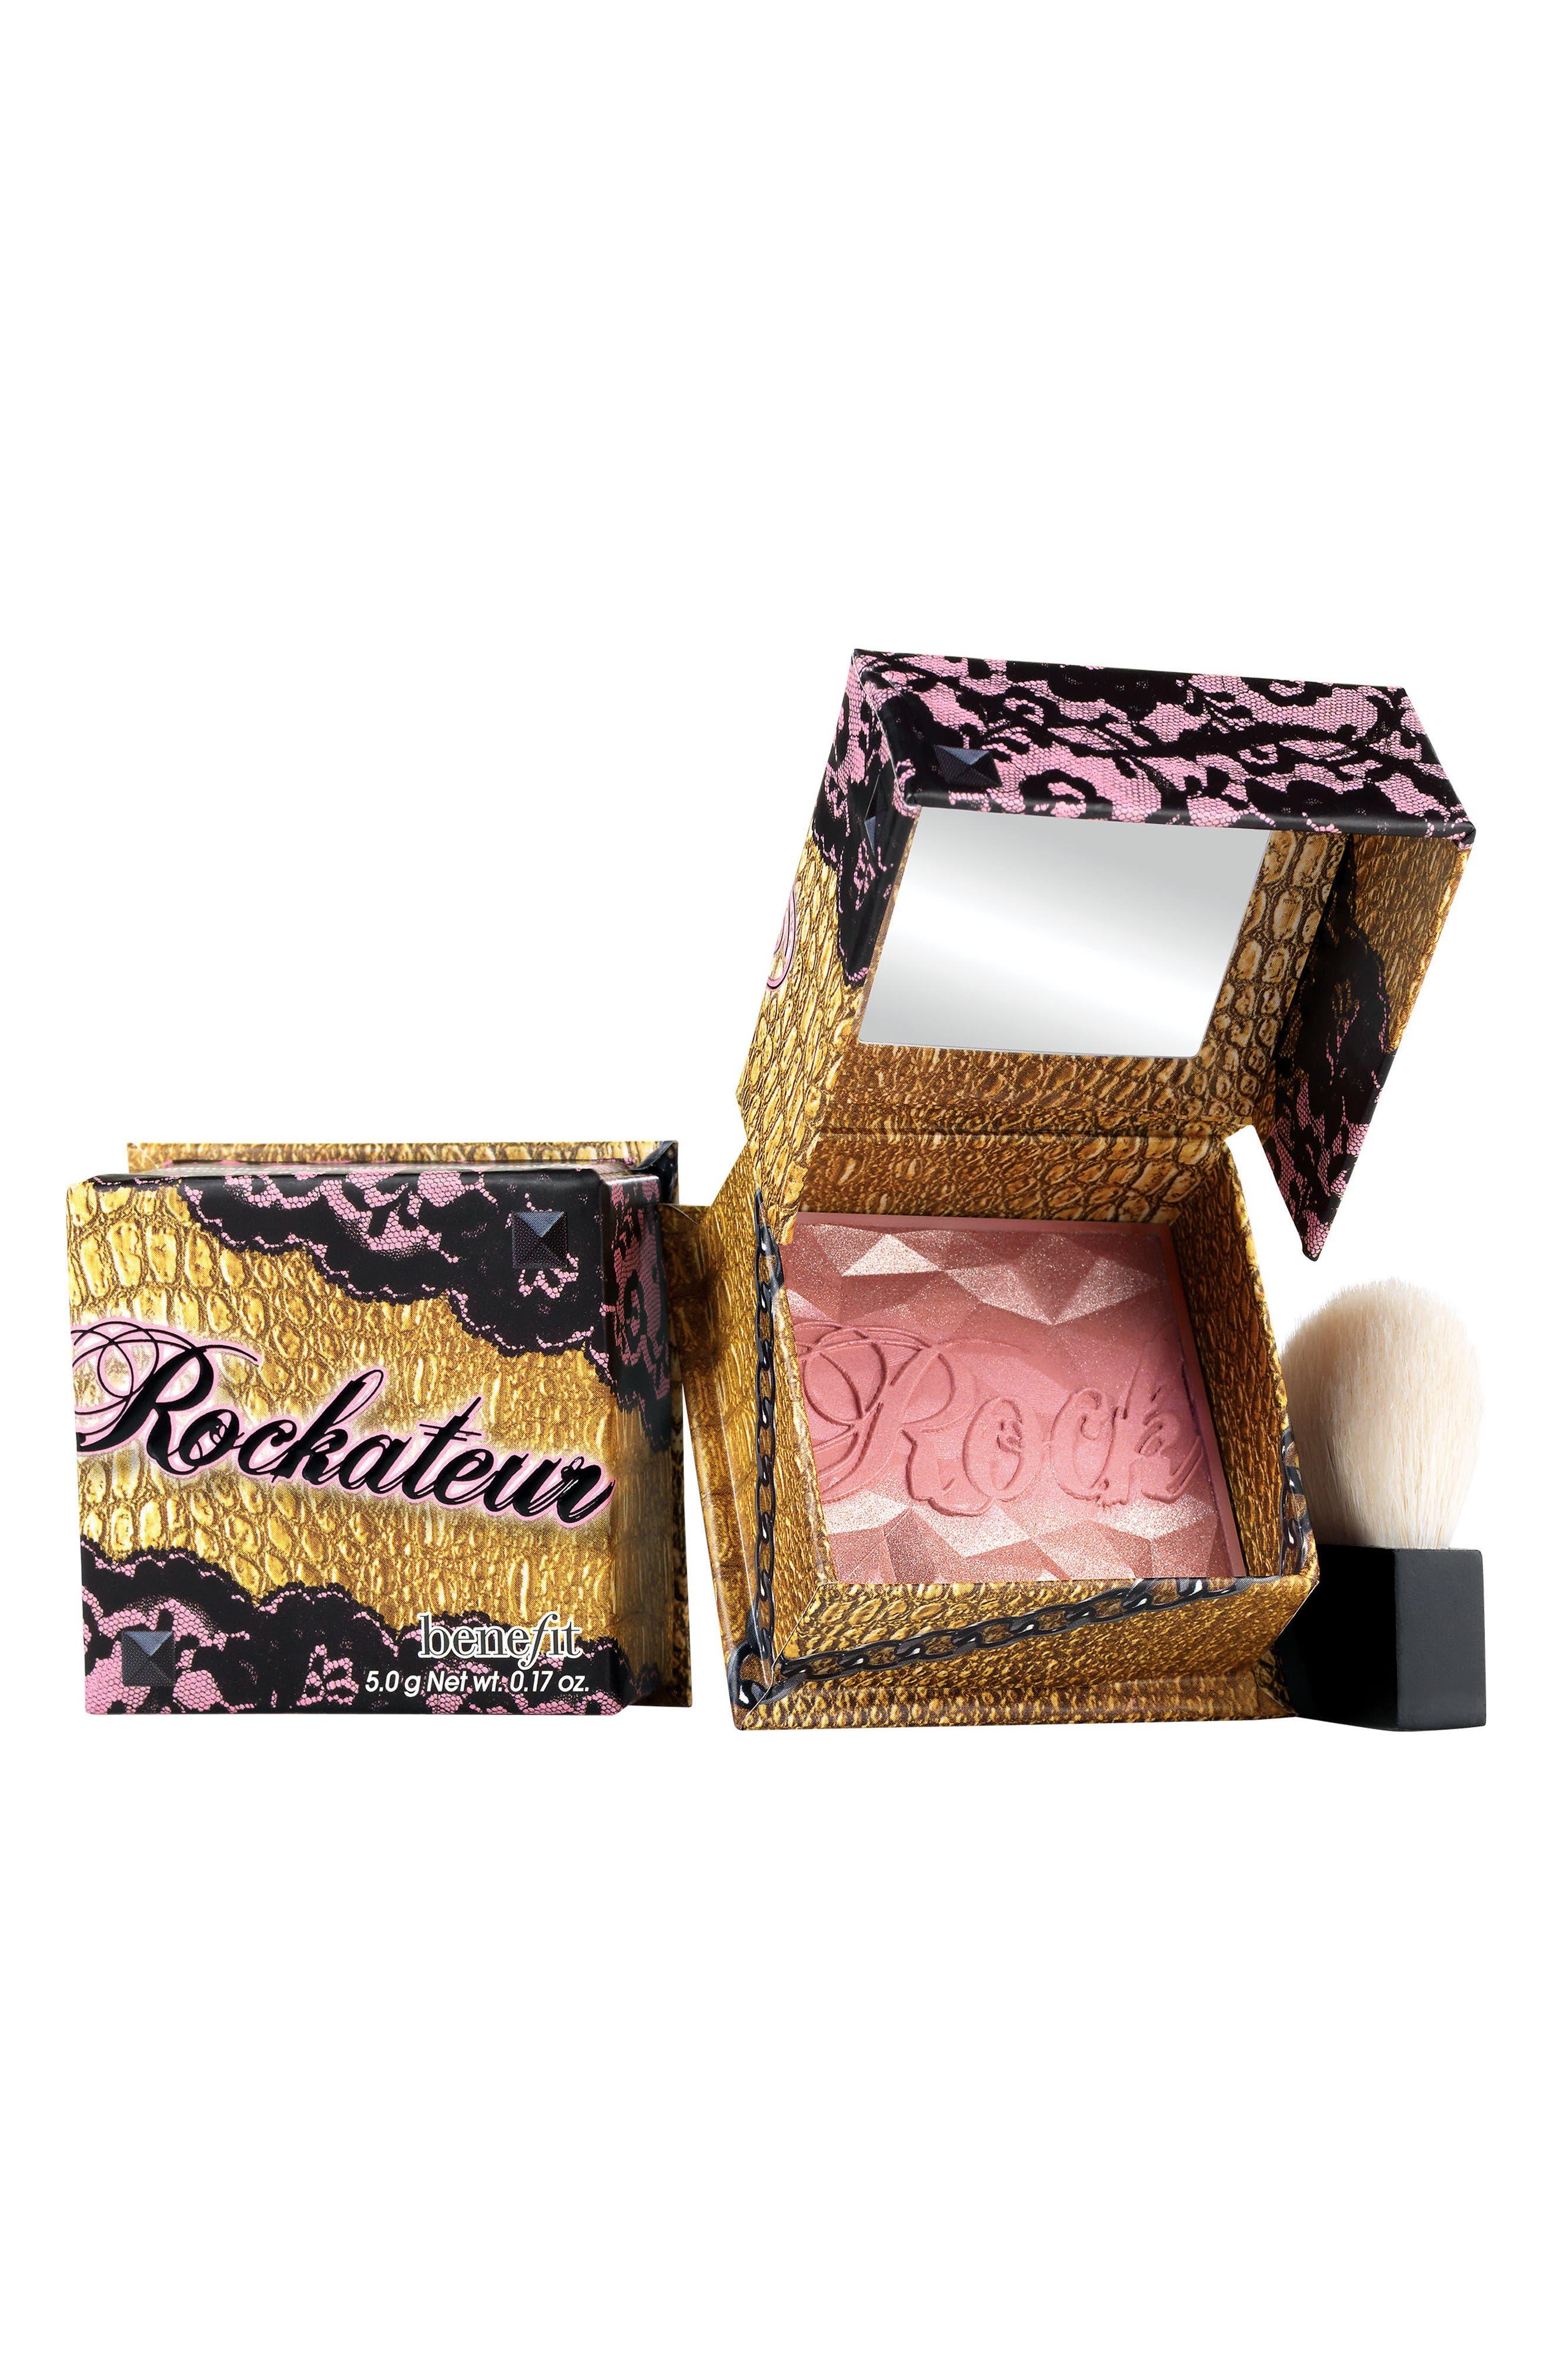 Benefit Rockateur Rose Gold Powder Blush,                         Main,                         color, Rose Gold